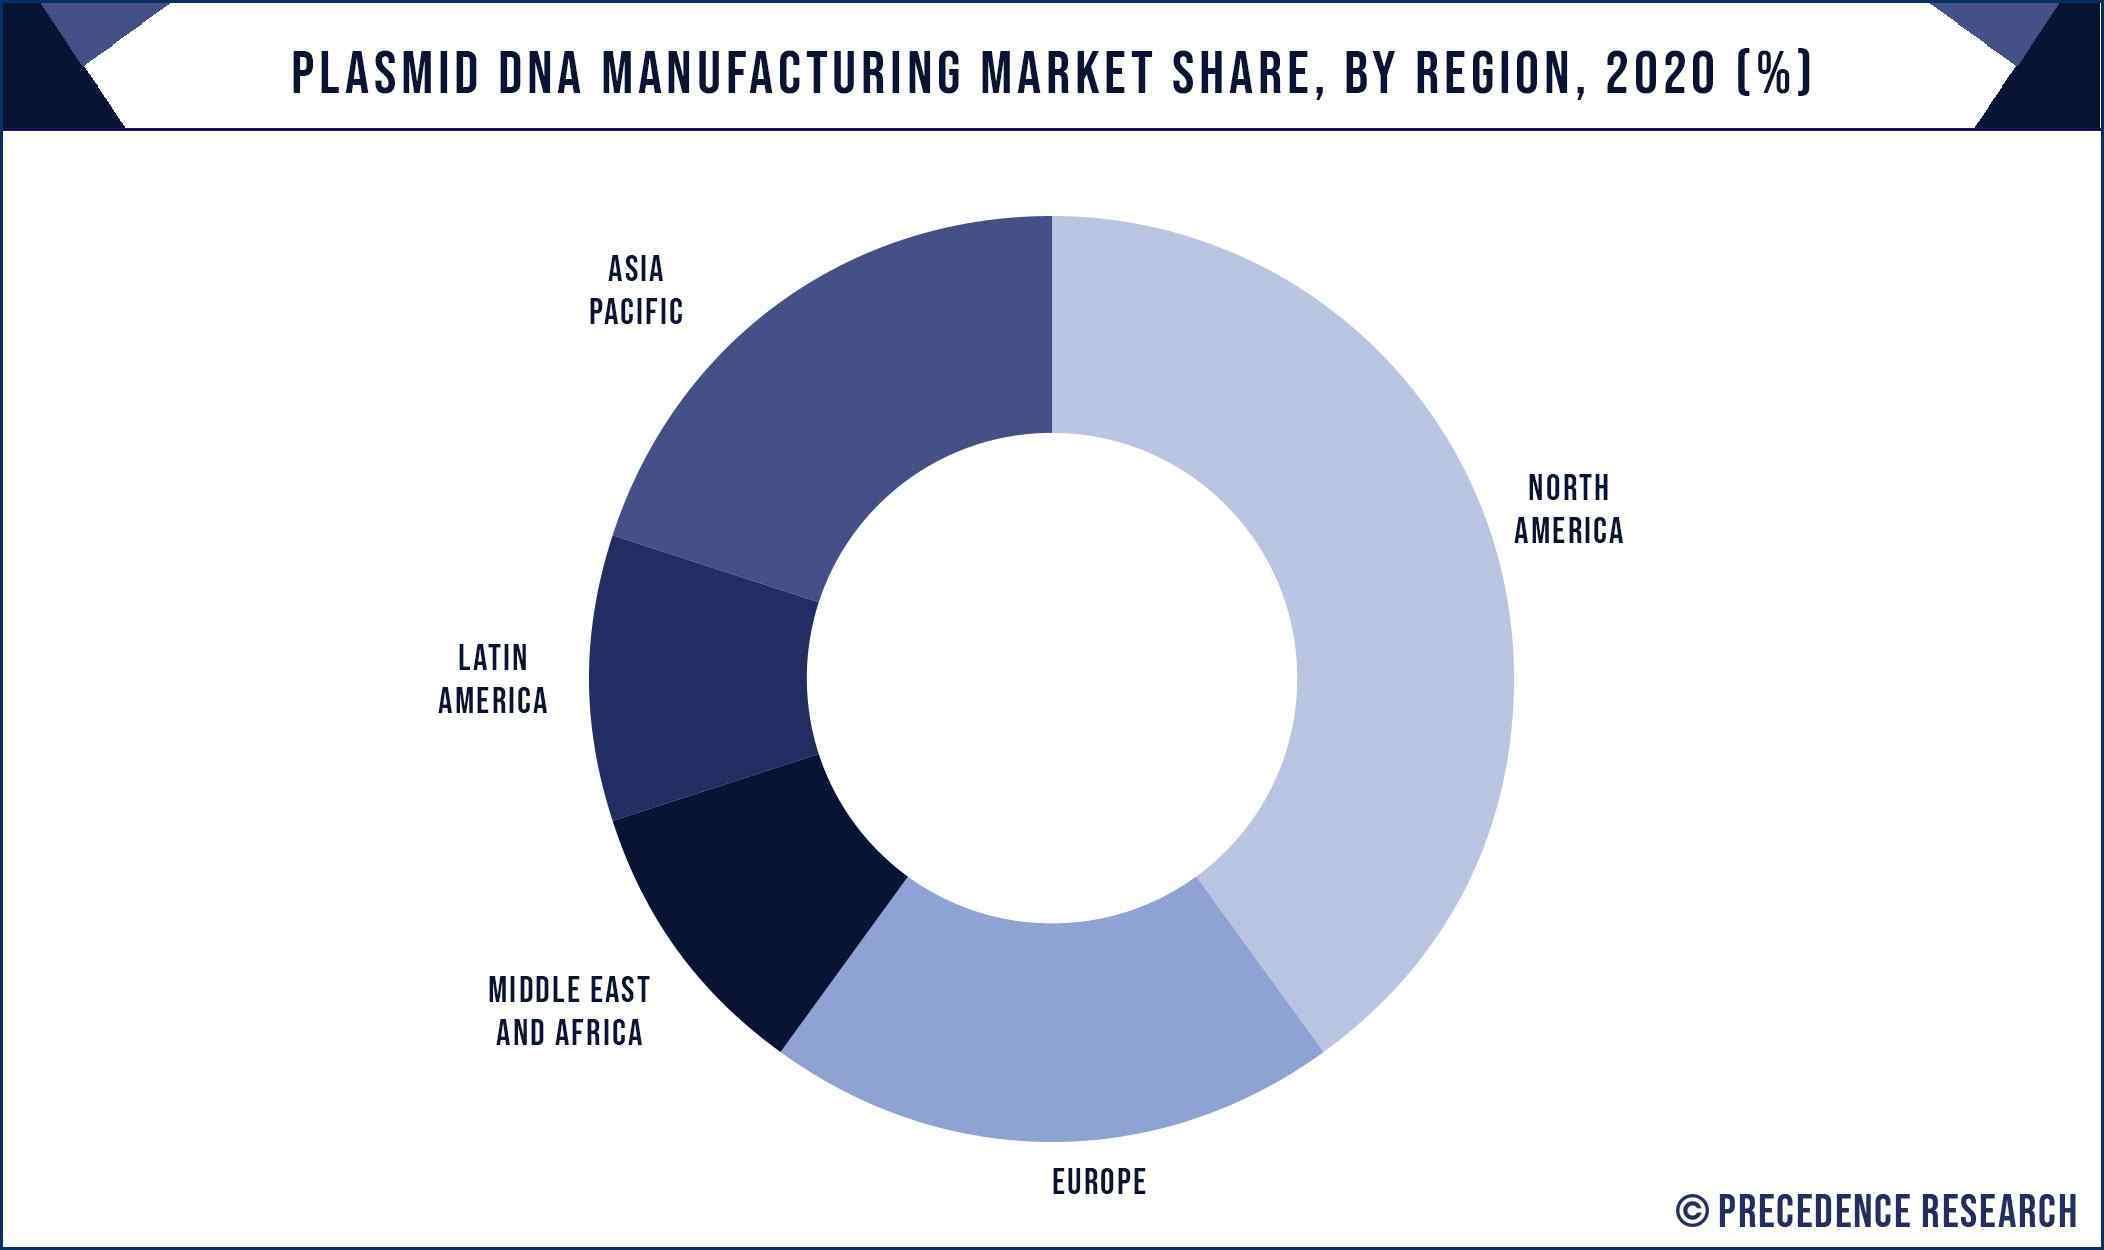 Plasmid DNA Manufacturing Market Share, By Region, 2020 (%)